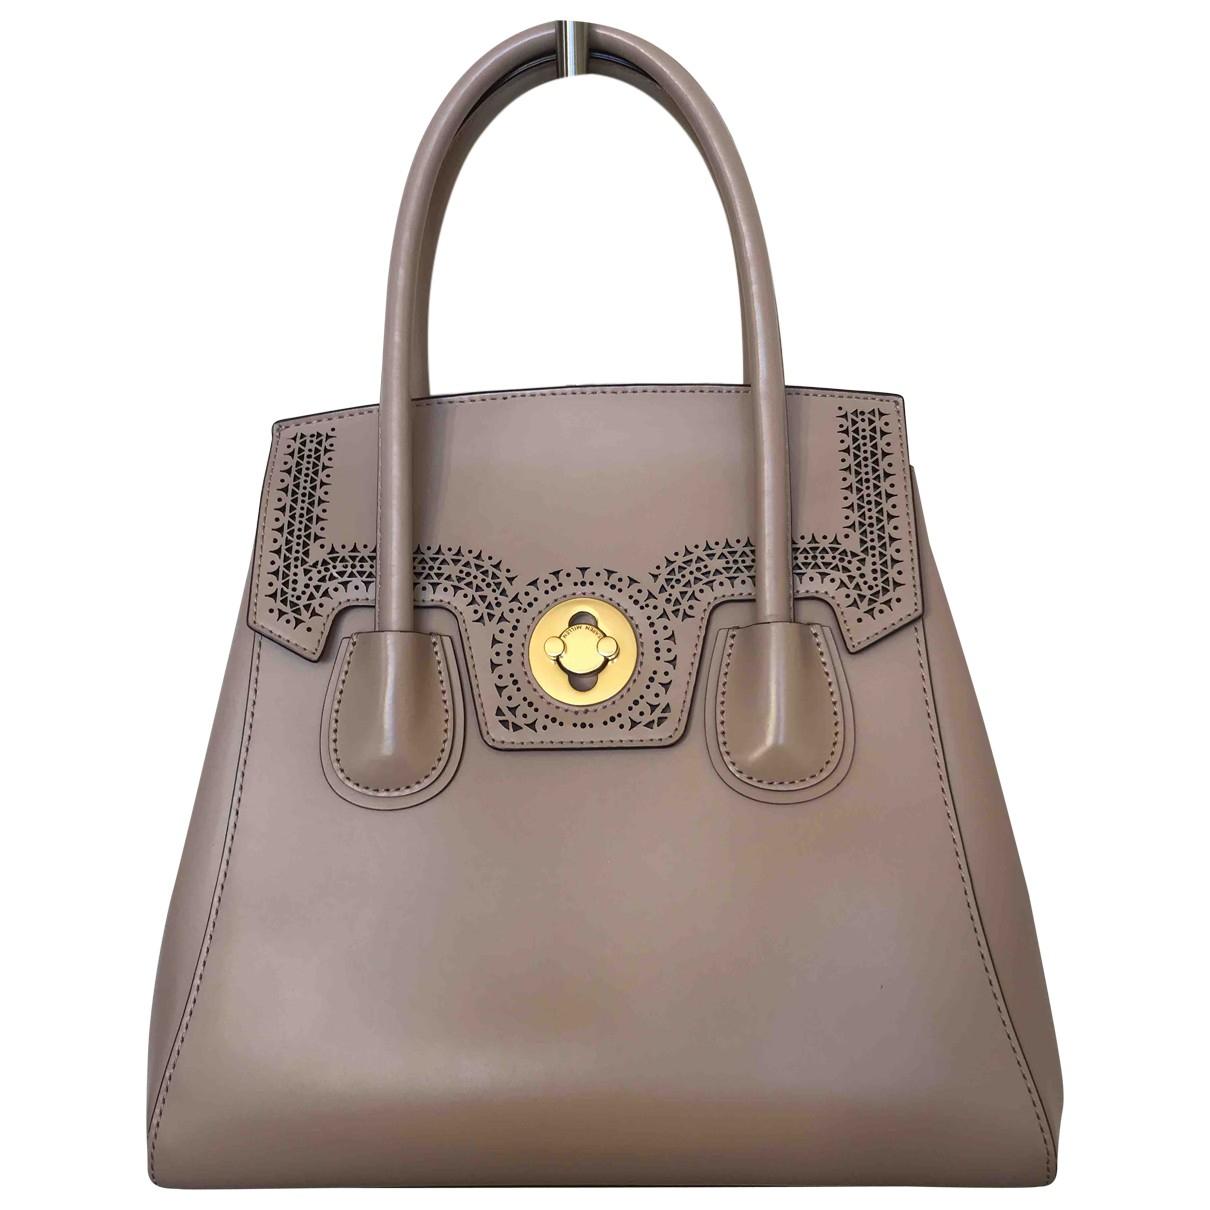 Karen Millen \N Leather handbag for Women \N